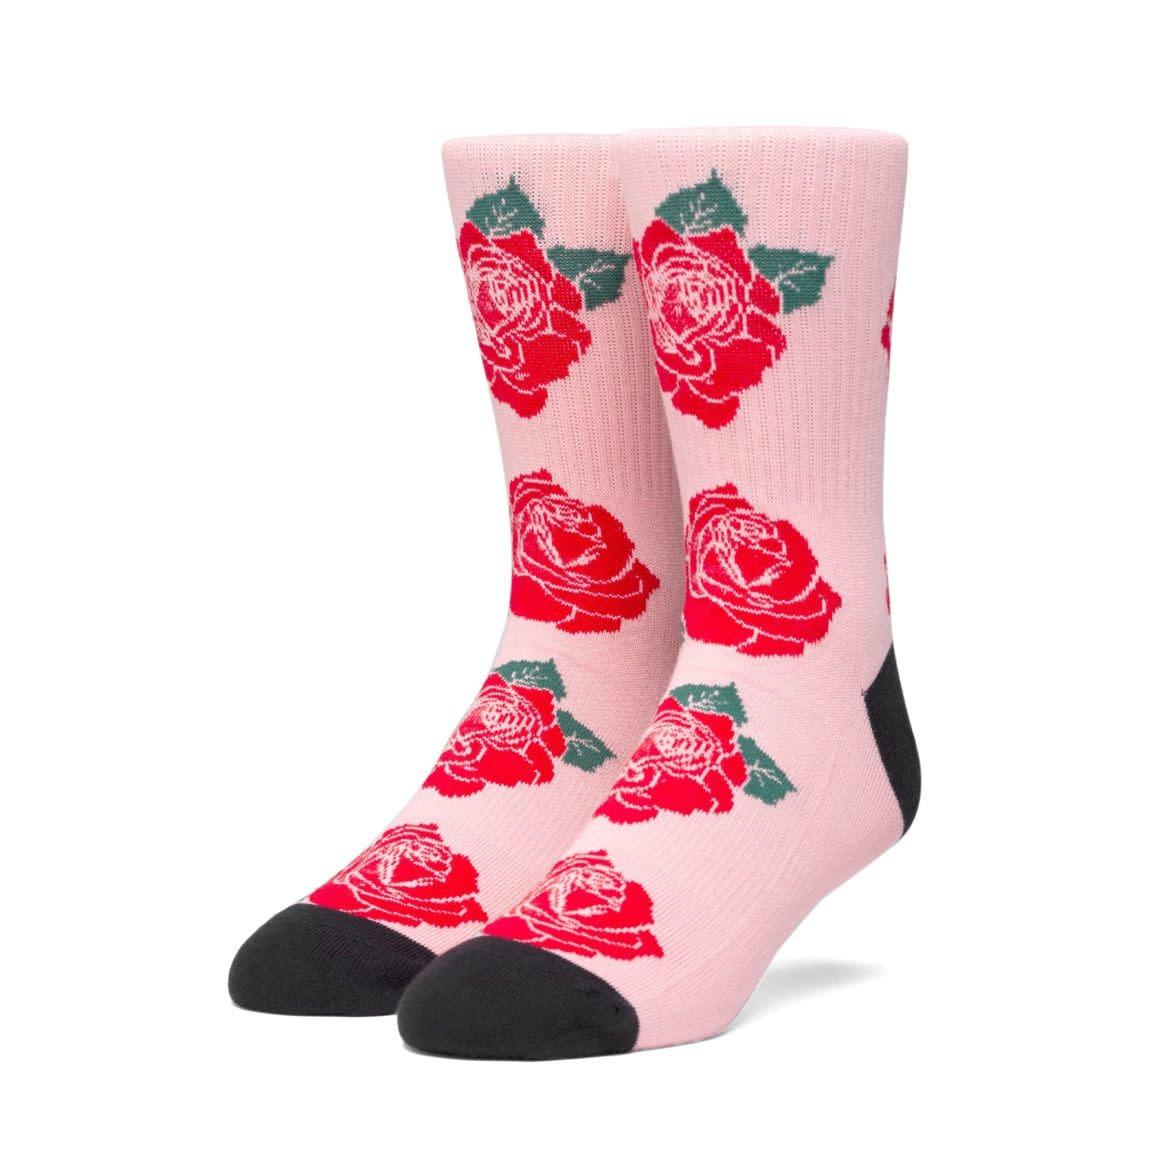 HUF Rose Socks Coral Pink